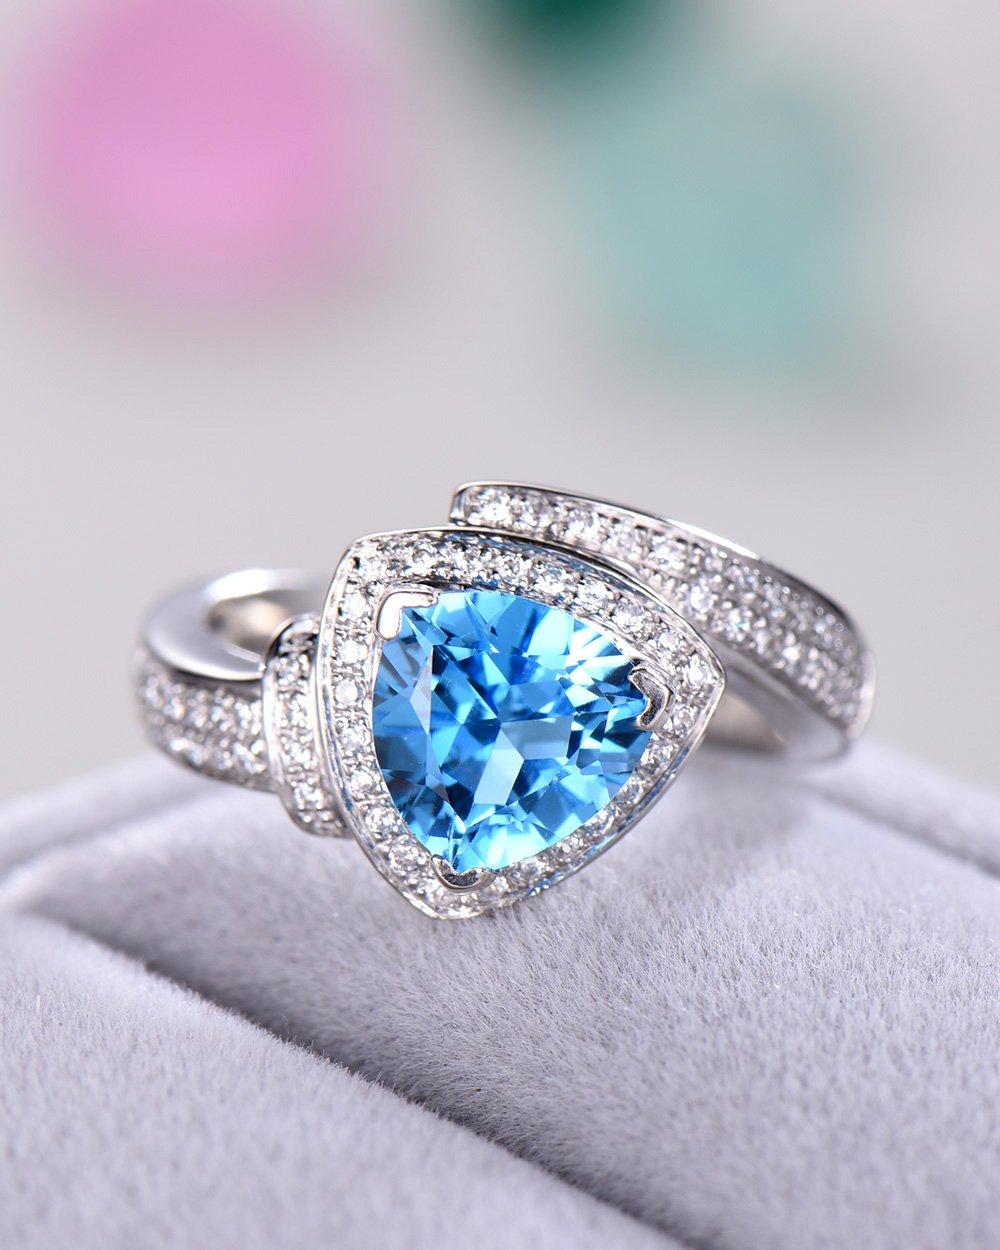 Blue Topaz Wedding Ring Trillion Cut 925 Sterling Silver White Gold CZ Diamond Halo Unique Engagement Set by Milejewel Topaz Engagement Ring (Image #3)